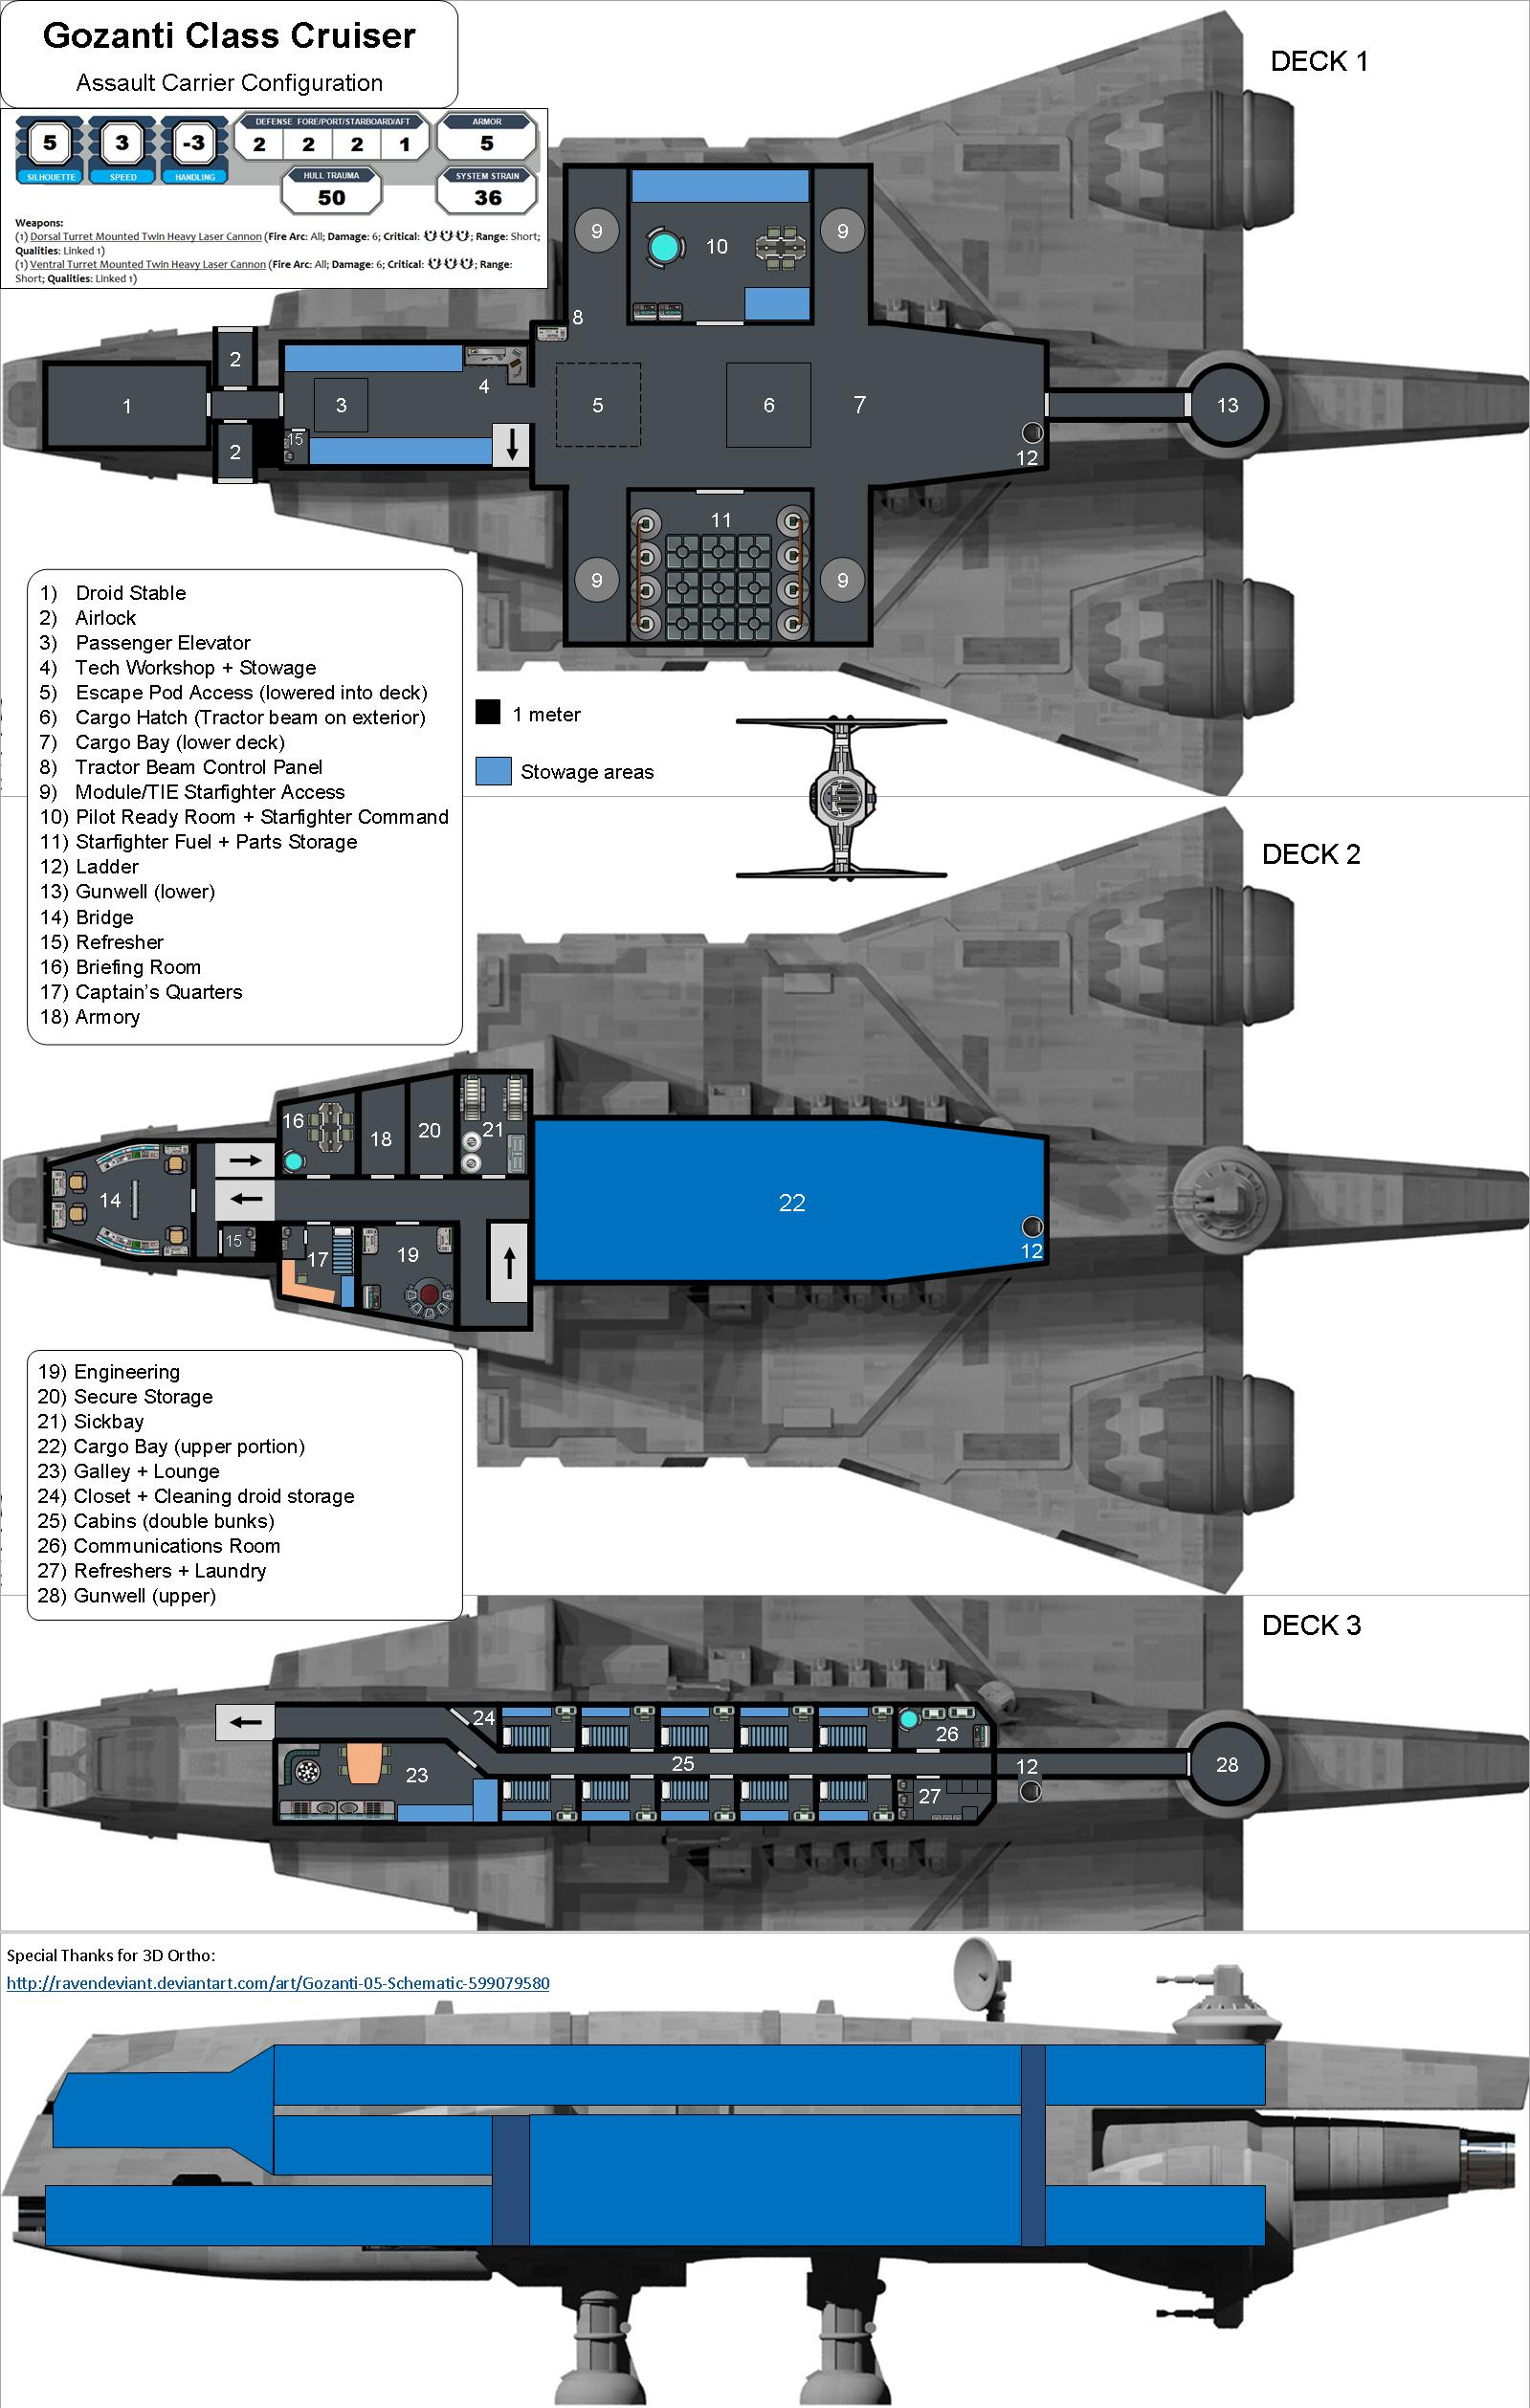 Gazanti_Assult_Carrier.jpg